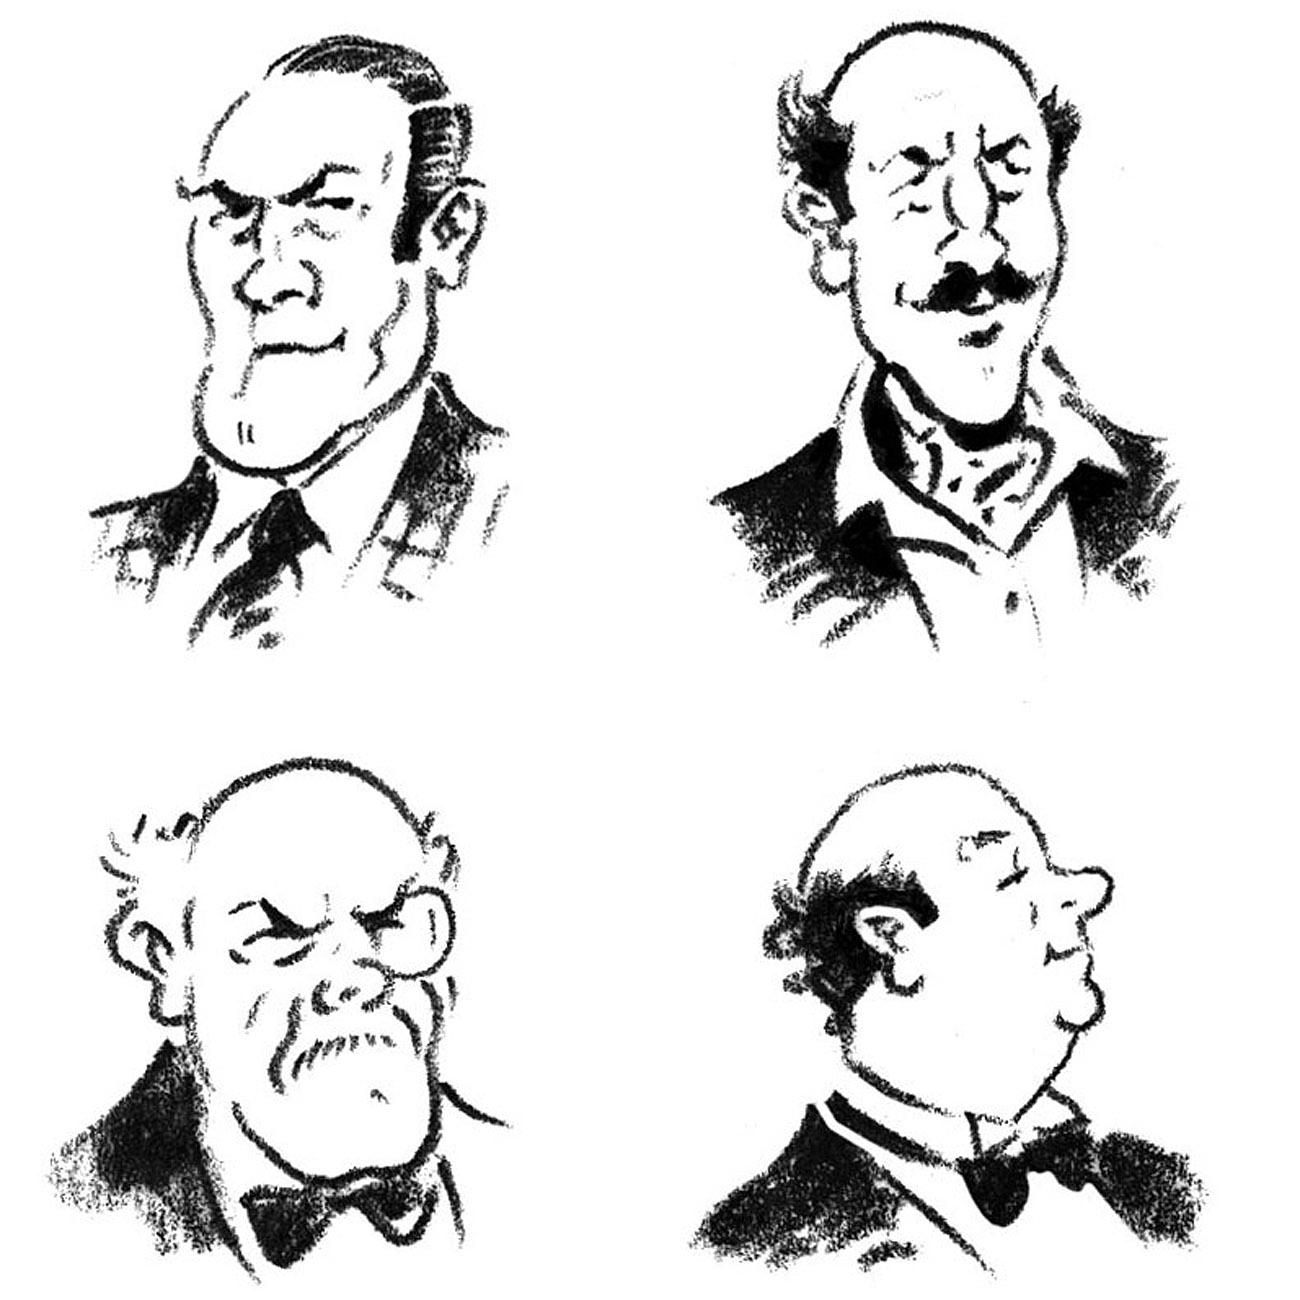 illustration for DR Harris characters | handbuilt cartoon illustrations